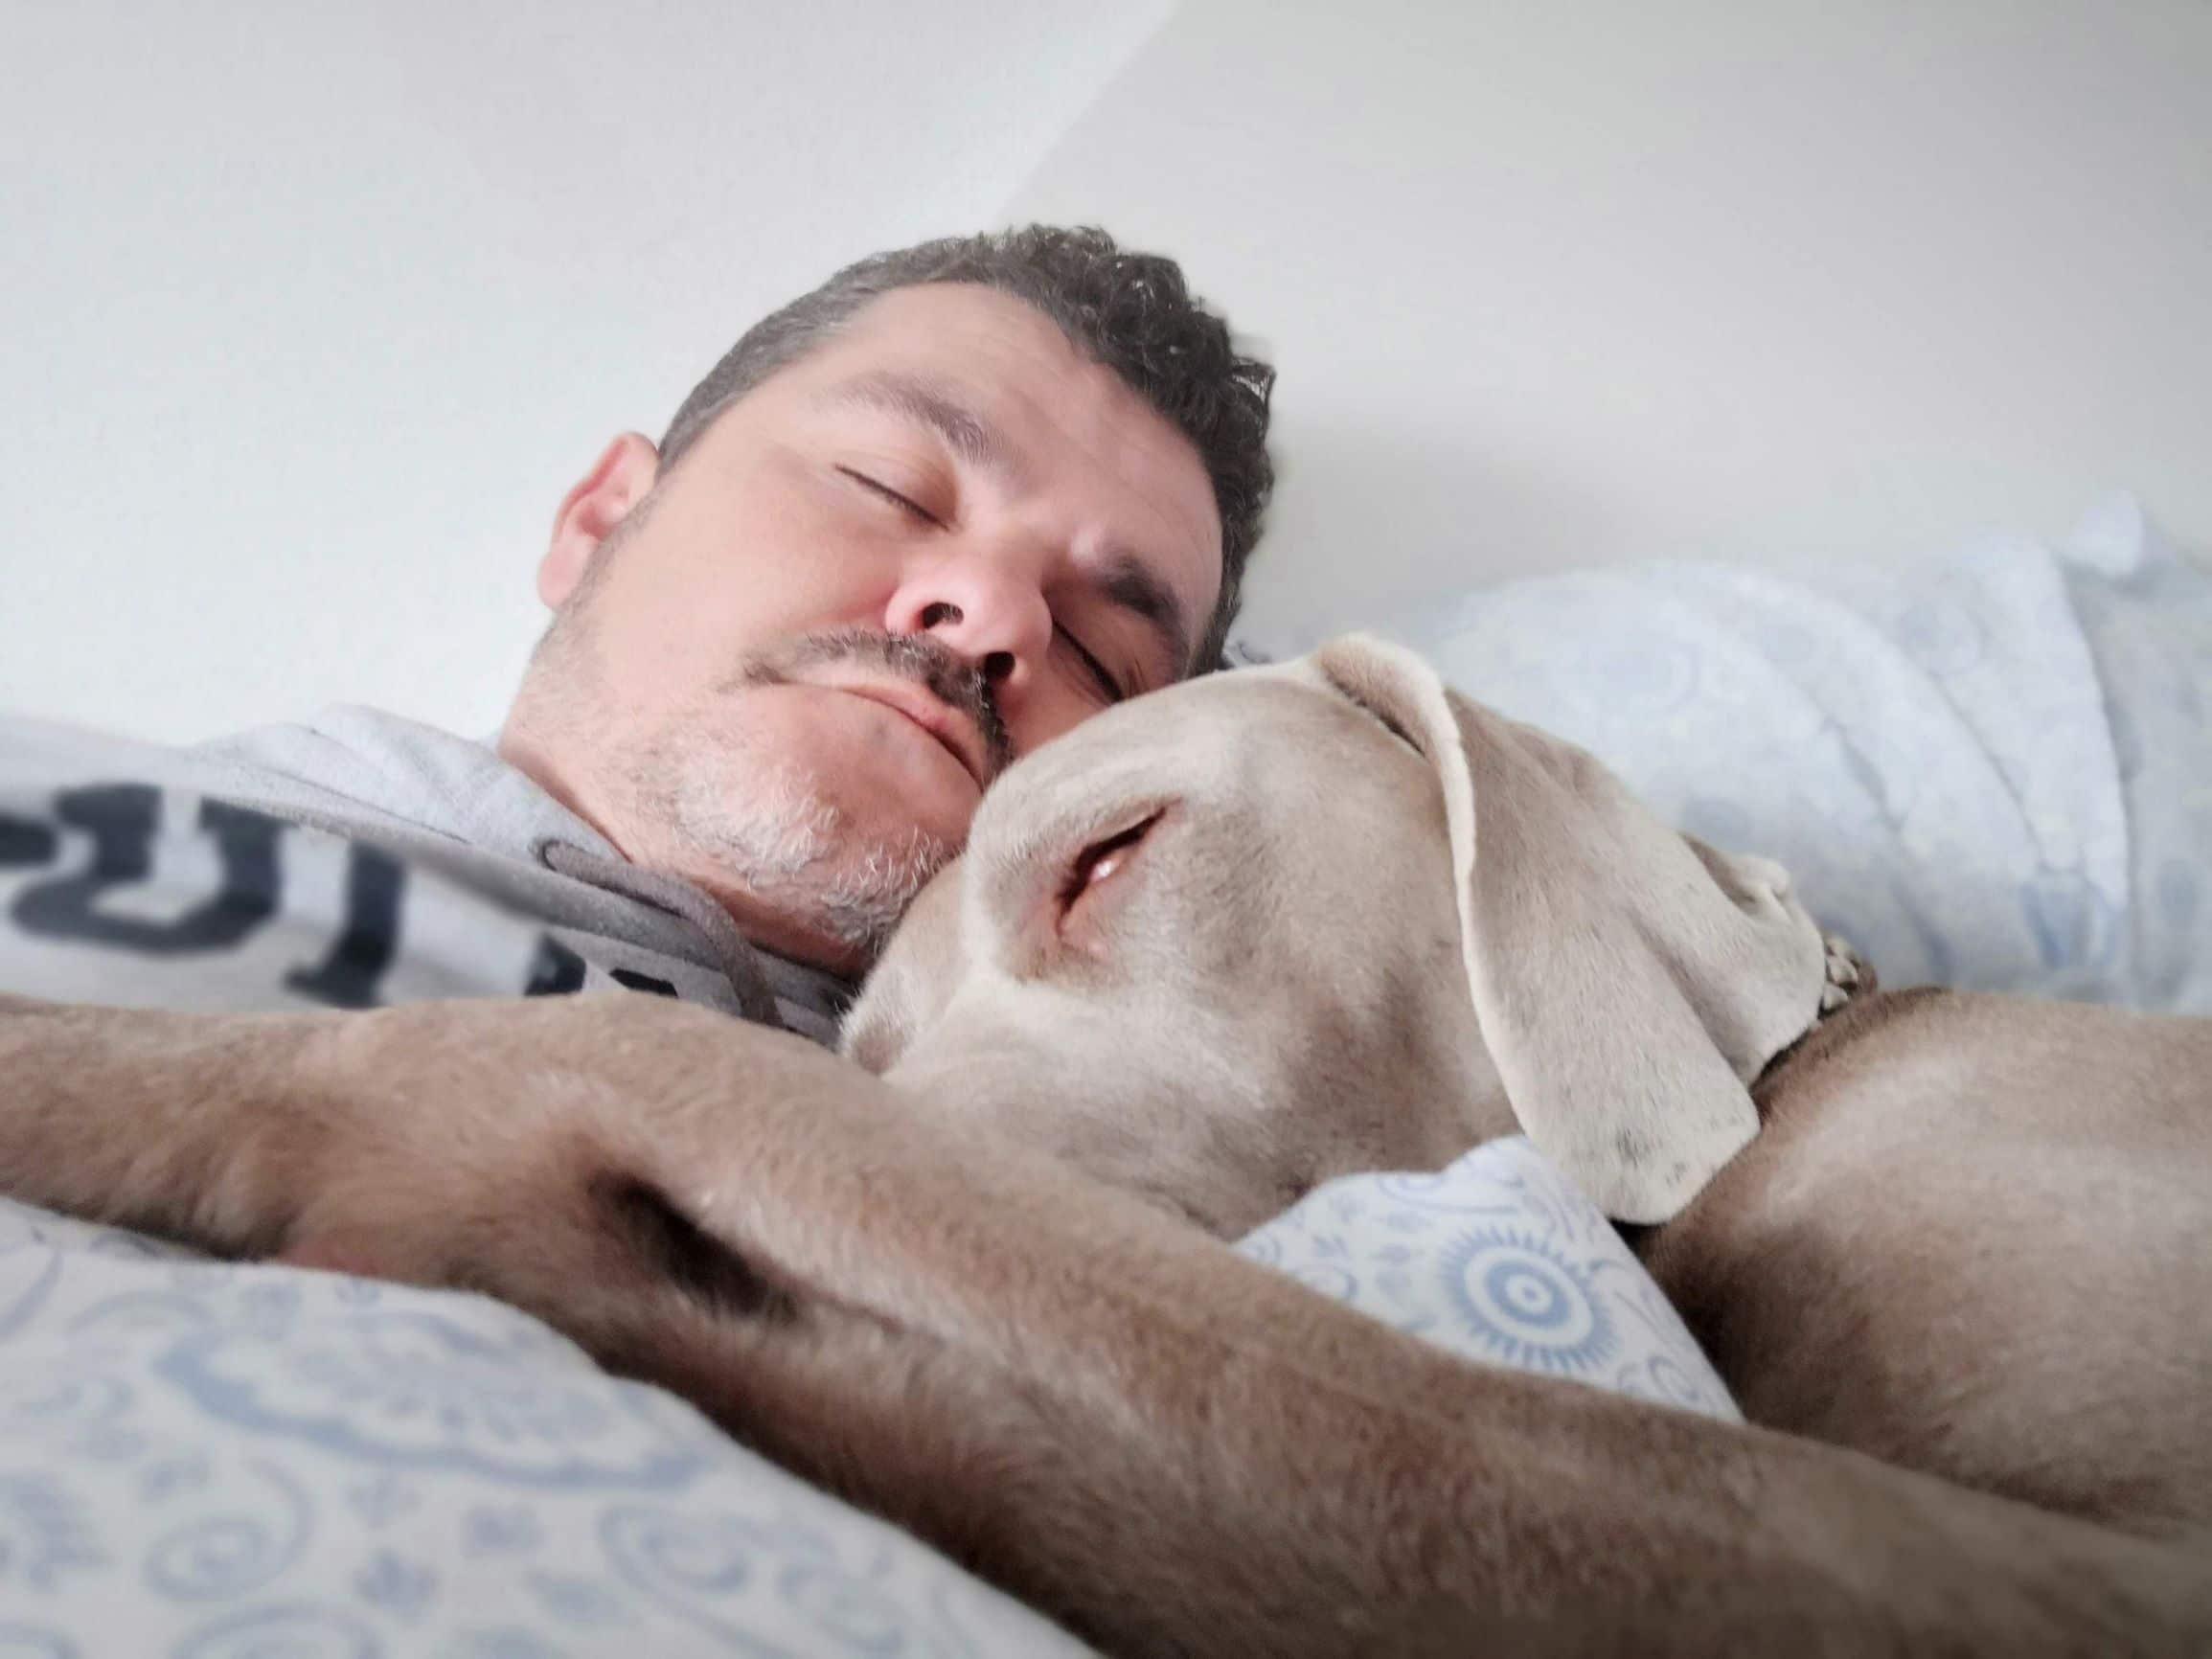 snoring and sleep apnia headaches